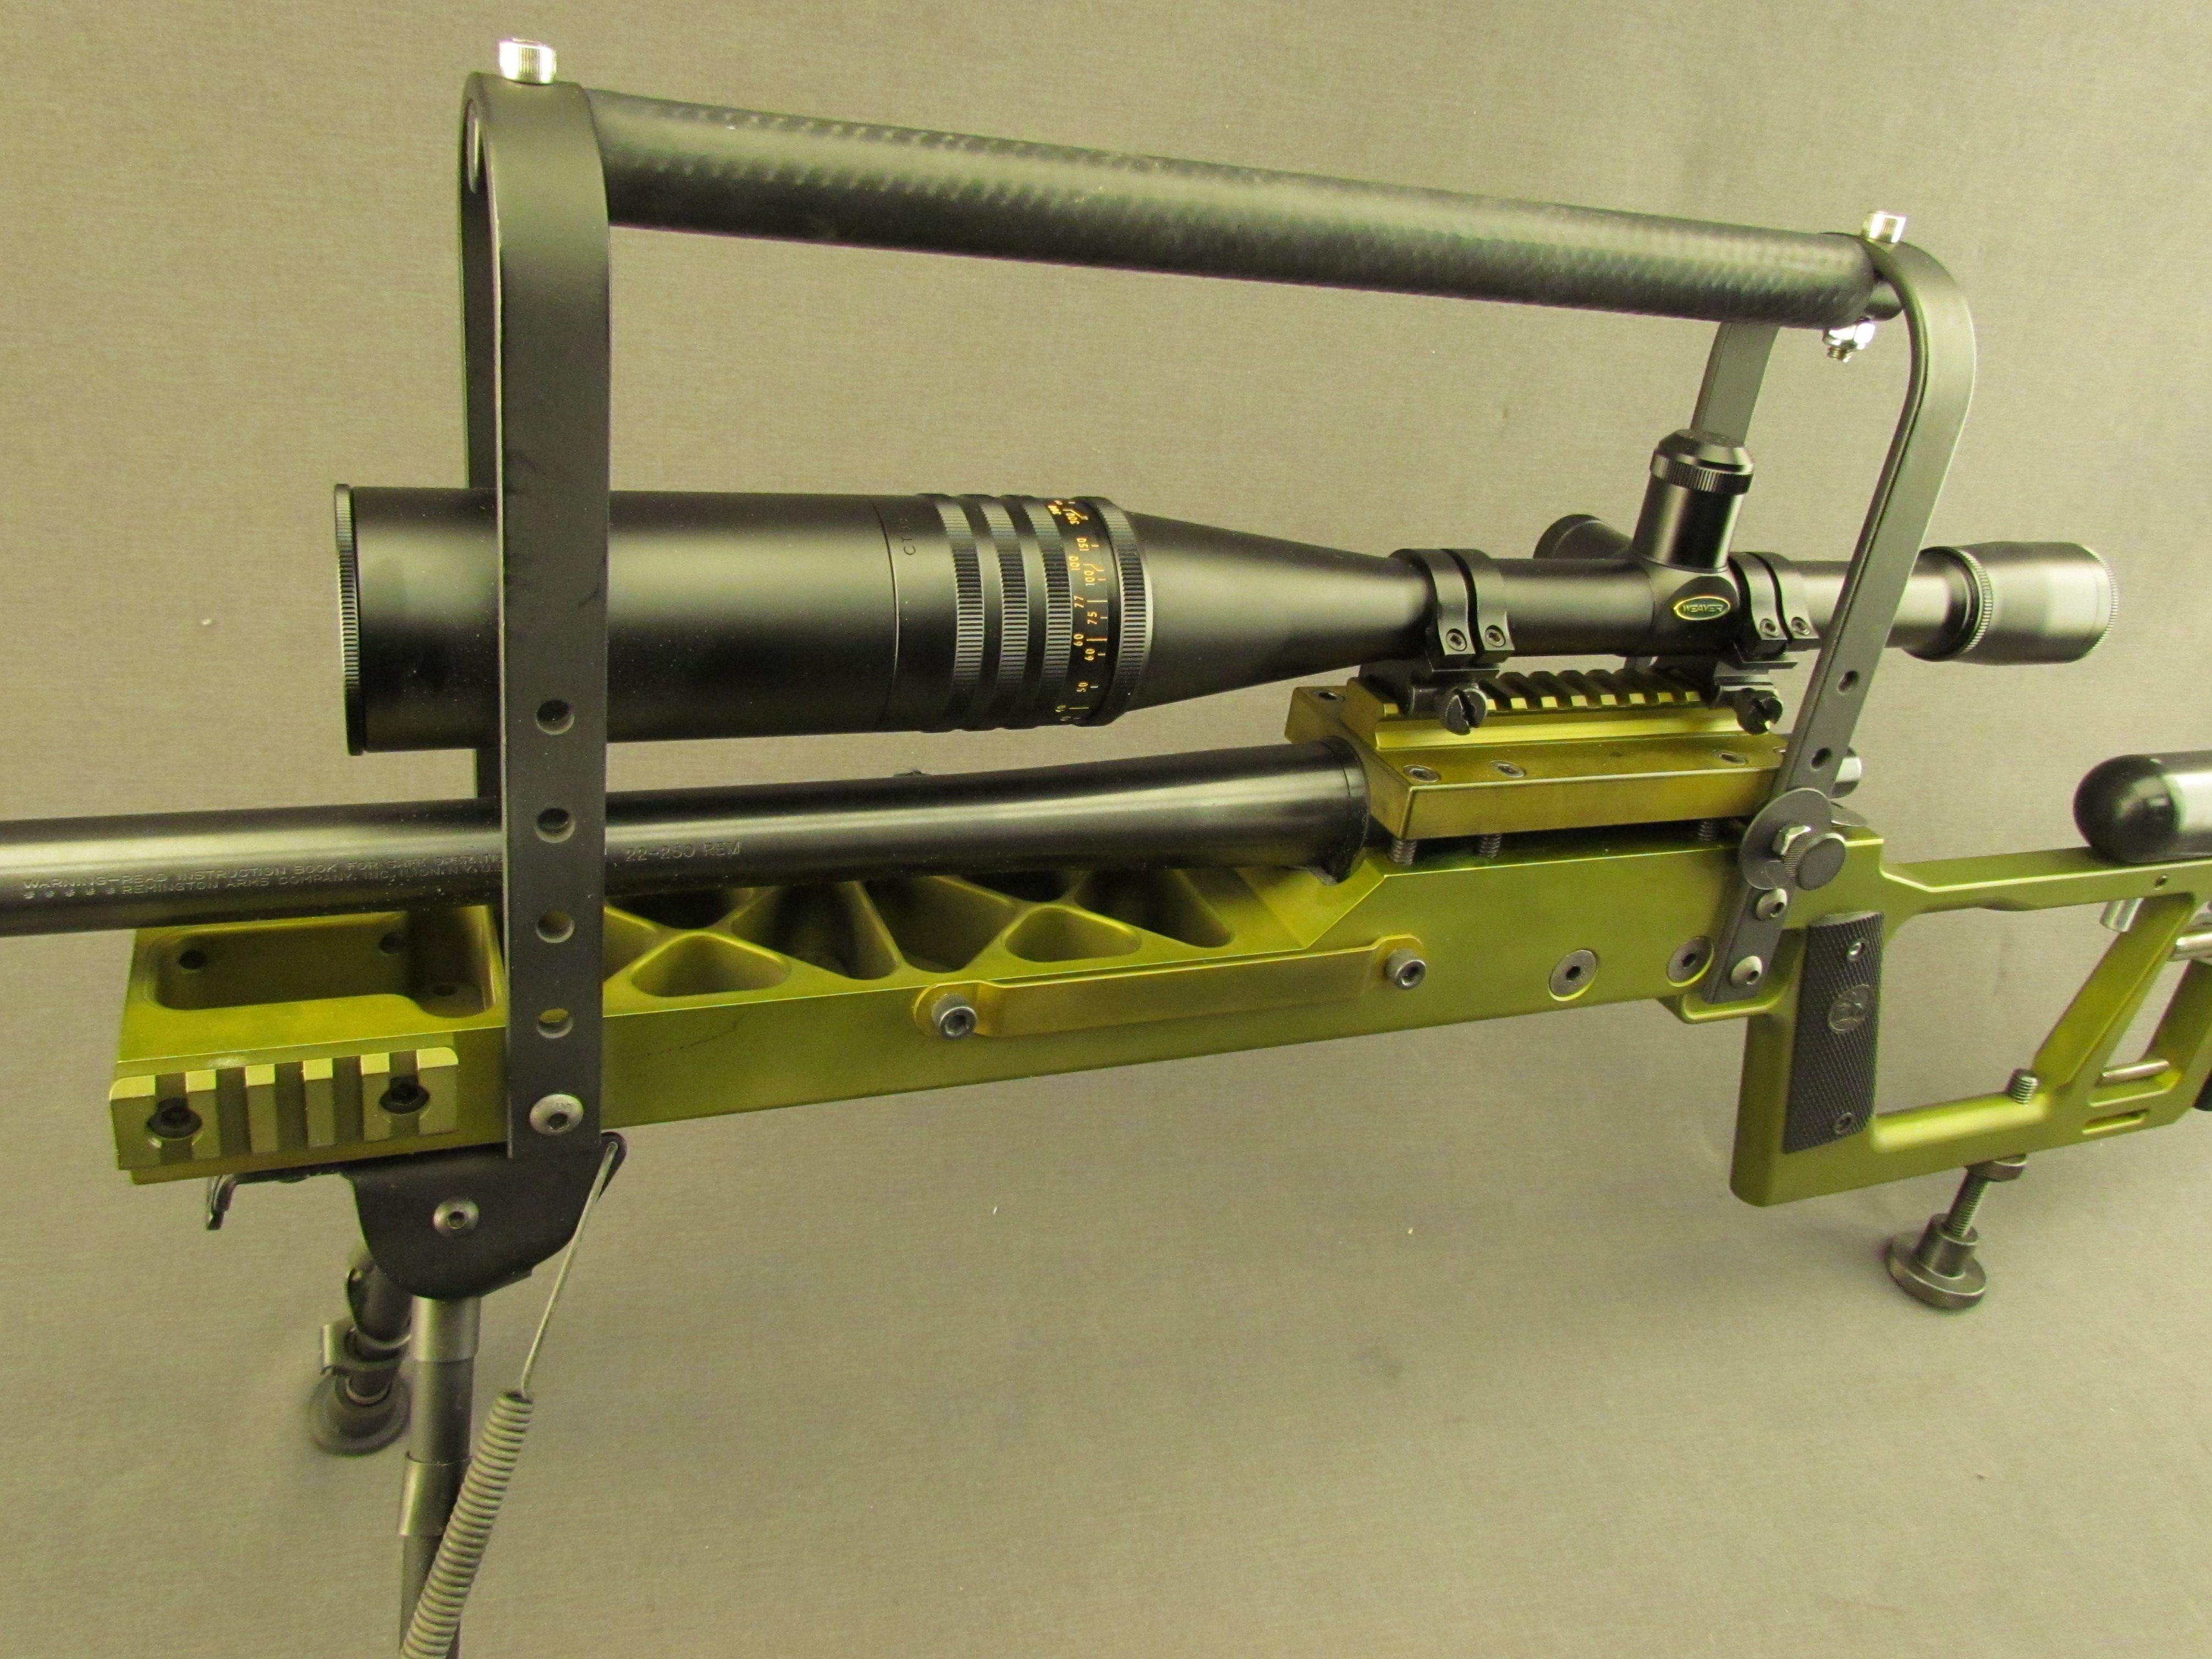 D&L Sports MR30 Professional Grade Precision Rifle | Guns